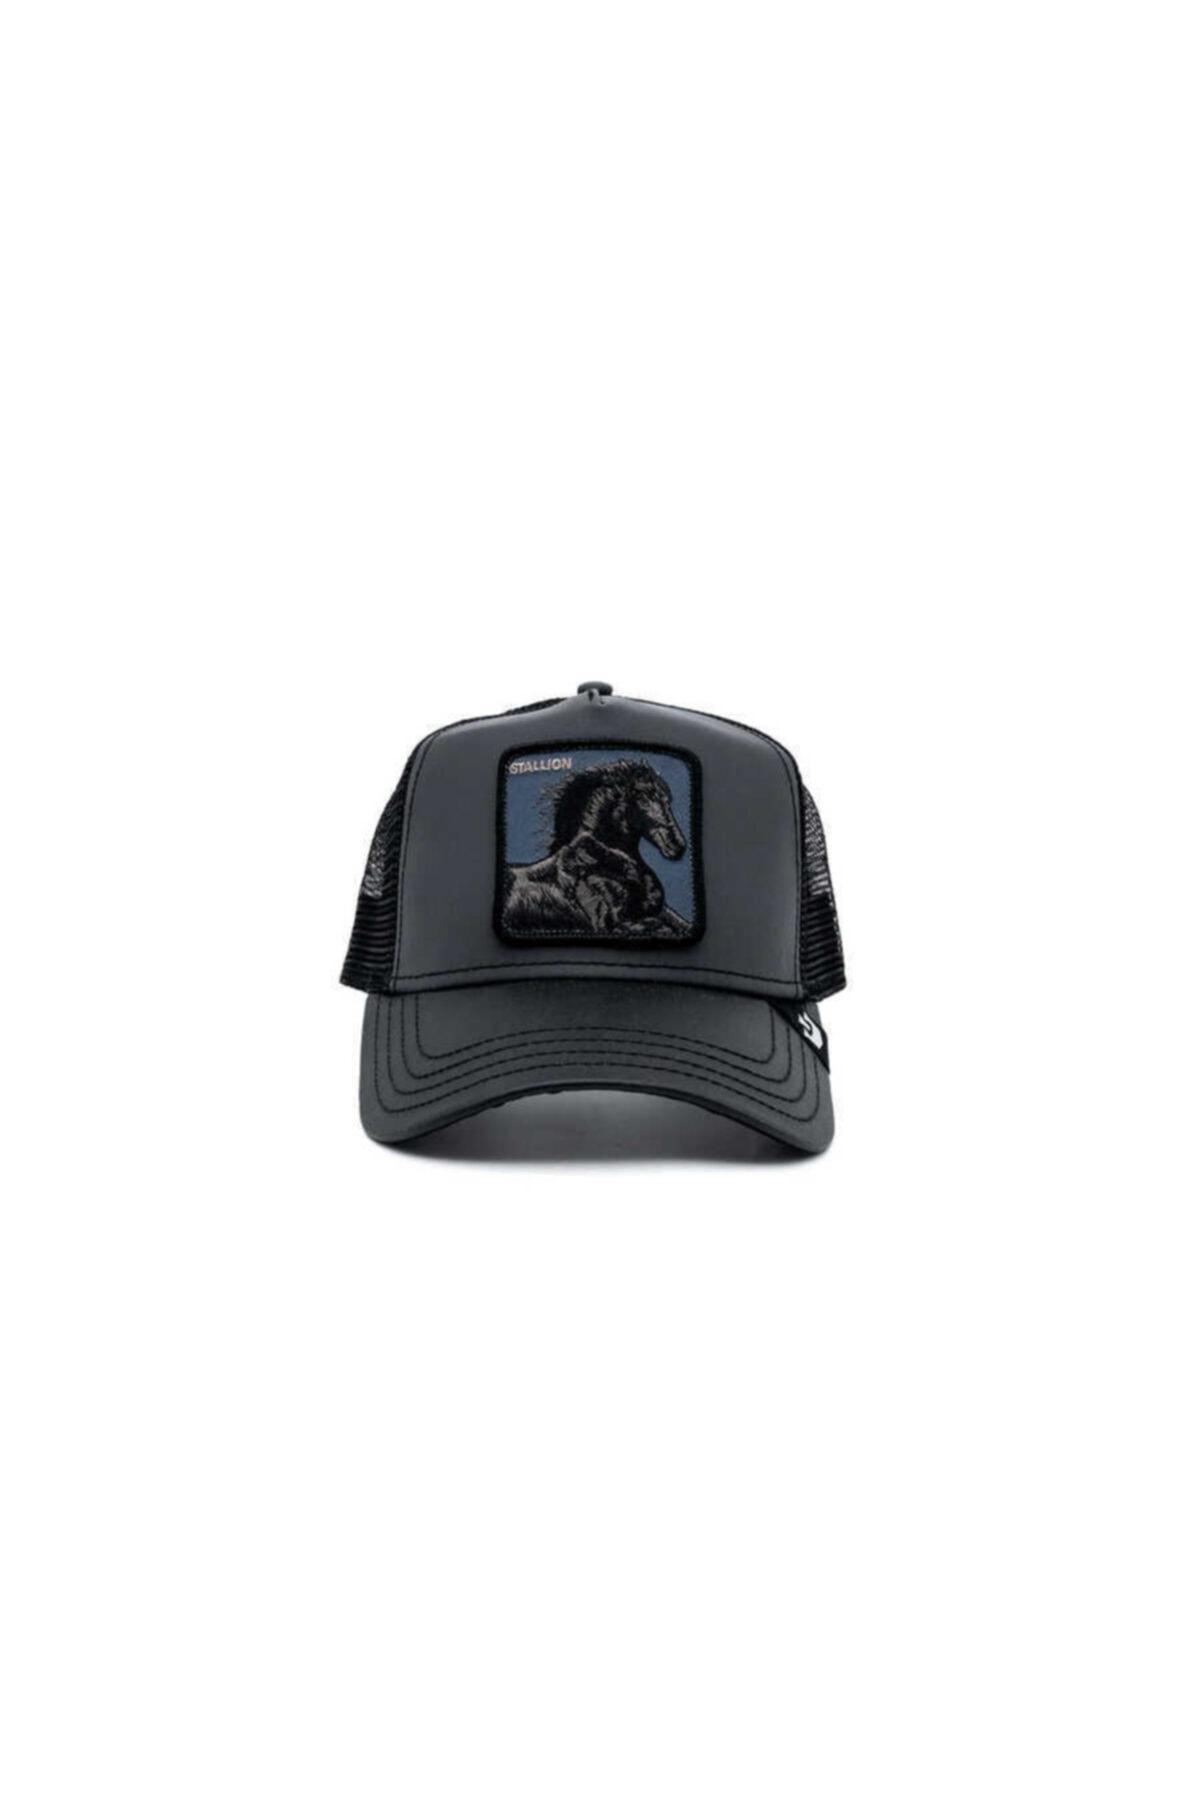 Unisex Siyah Ride That Stallion  Şapka 101-2679 Standart